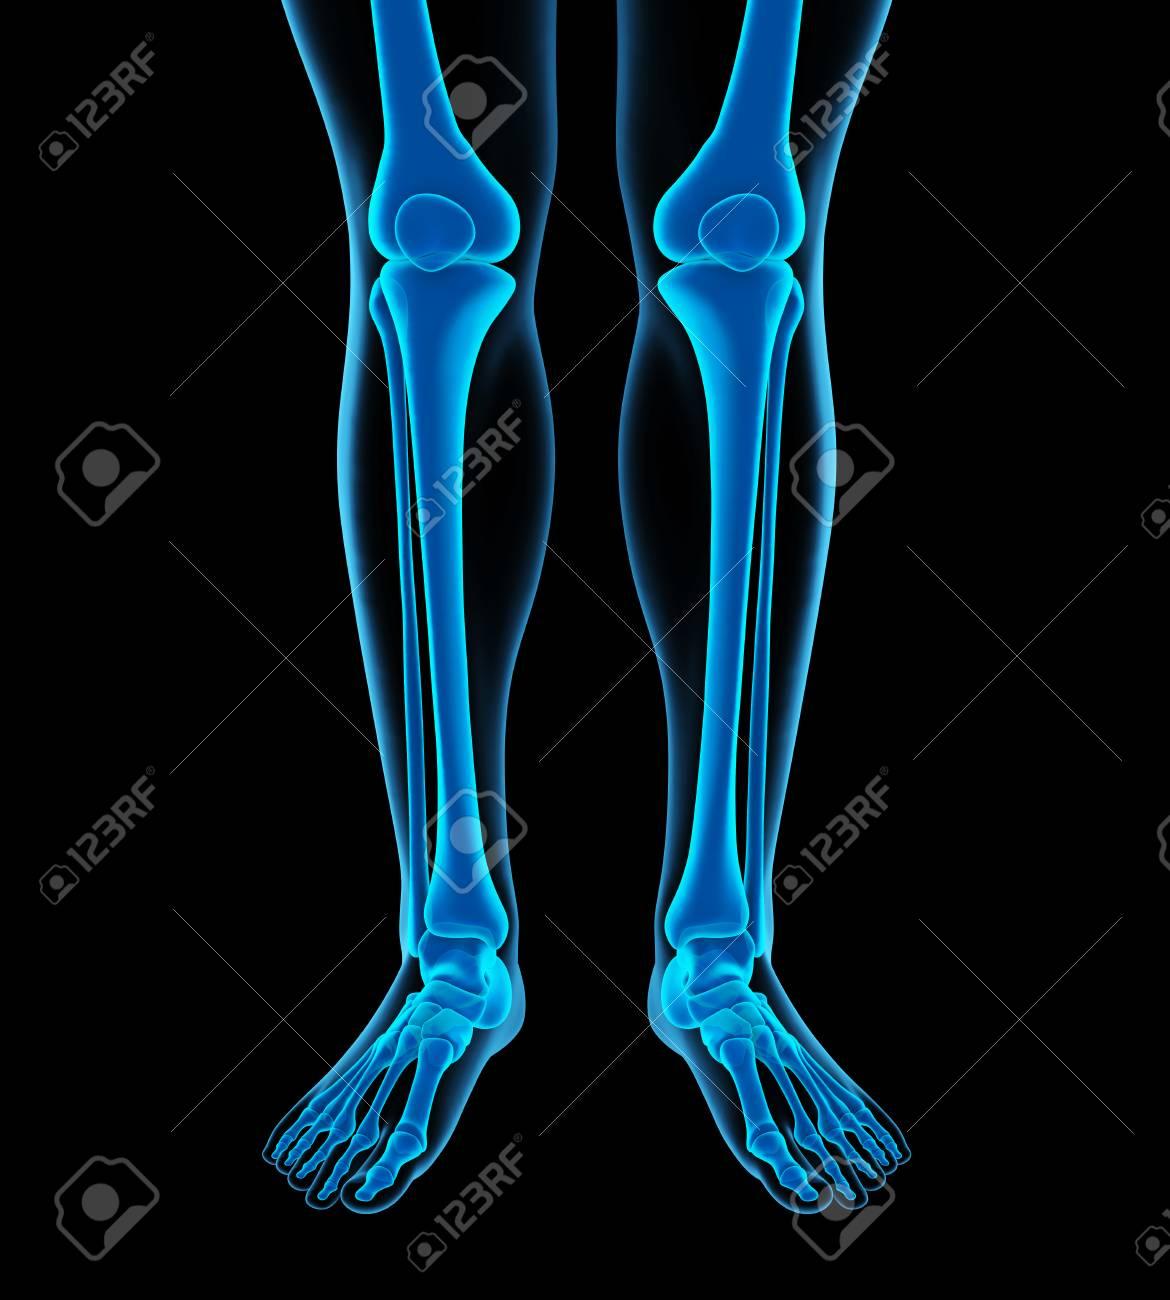 Human Leg Bones Anatomy Stock Photo Picture And Royalty Free Image